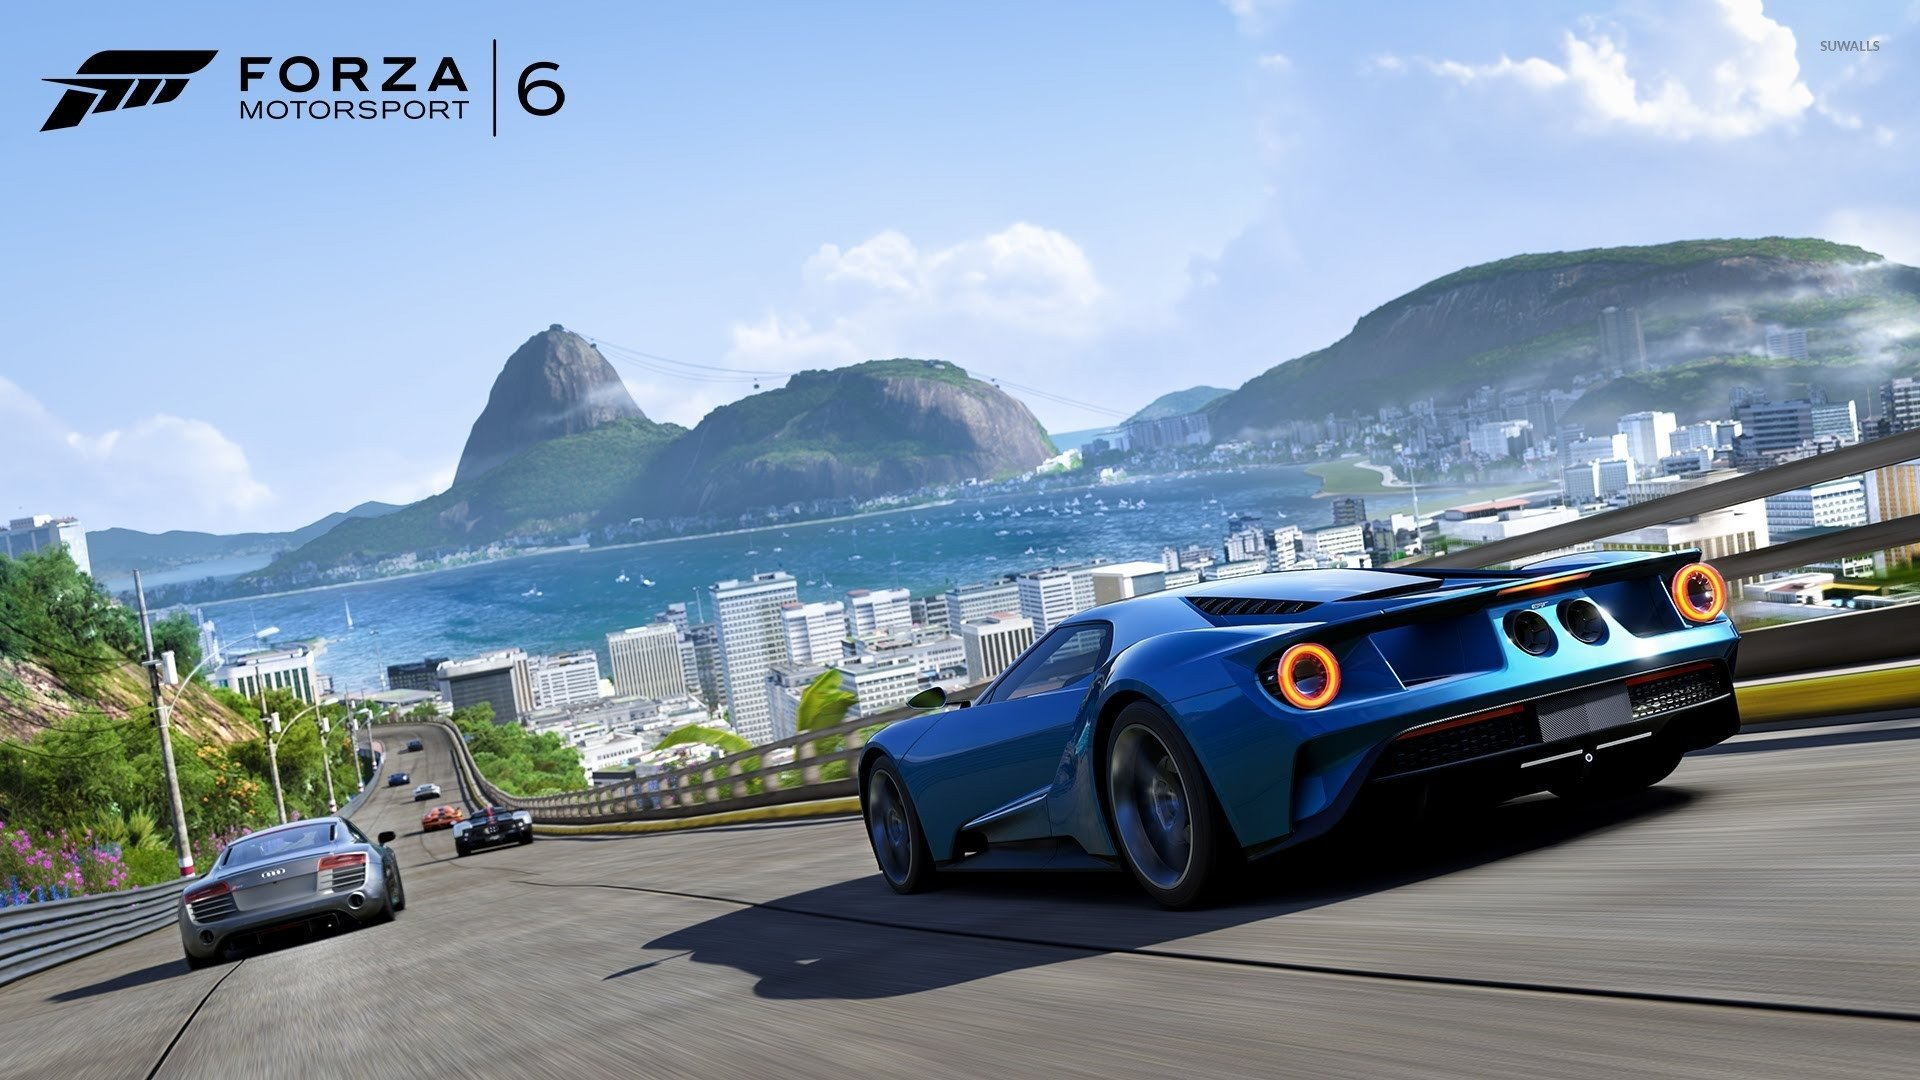 Forza Motorsport 6 wallpaper   Game wallpapers   44240 1366x768